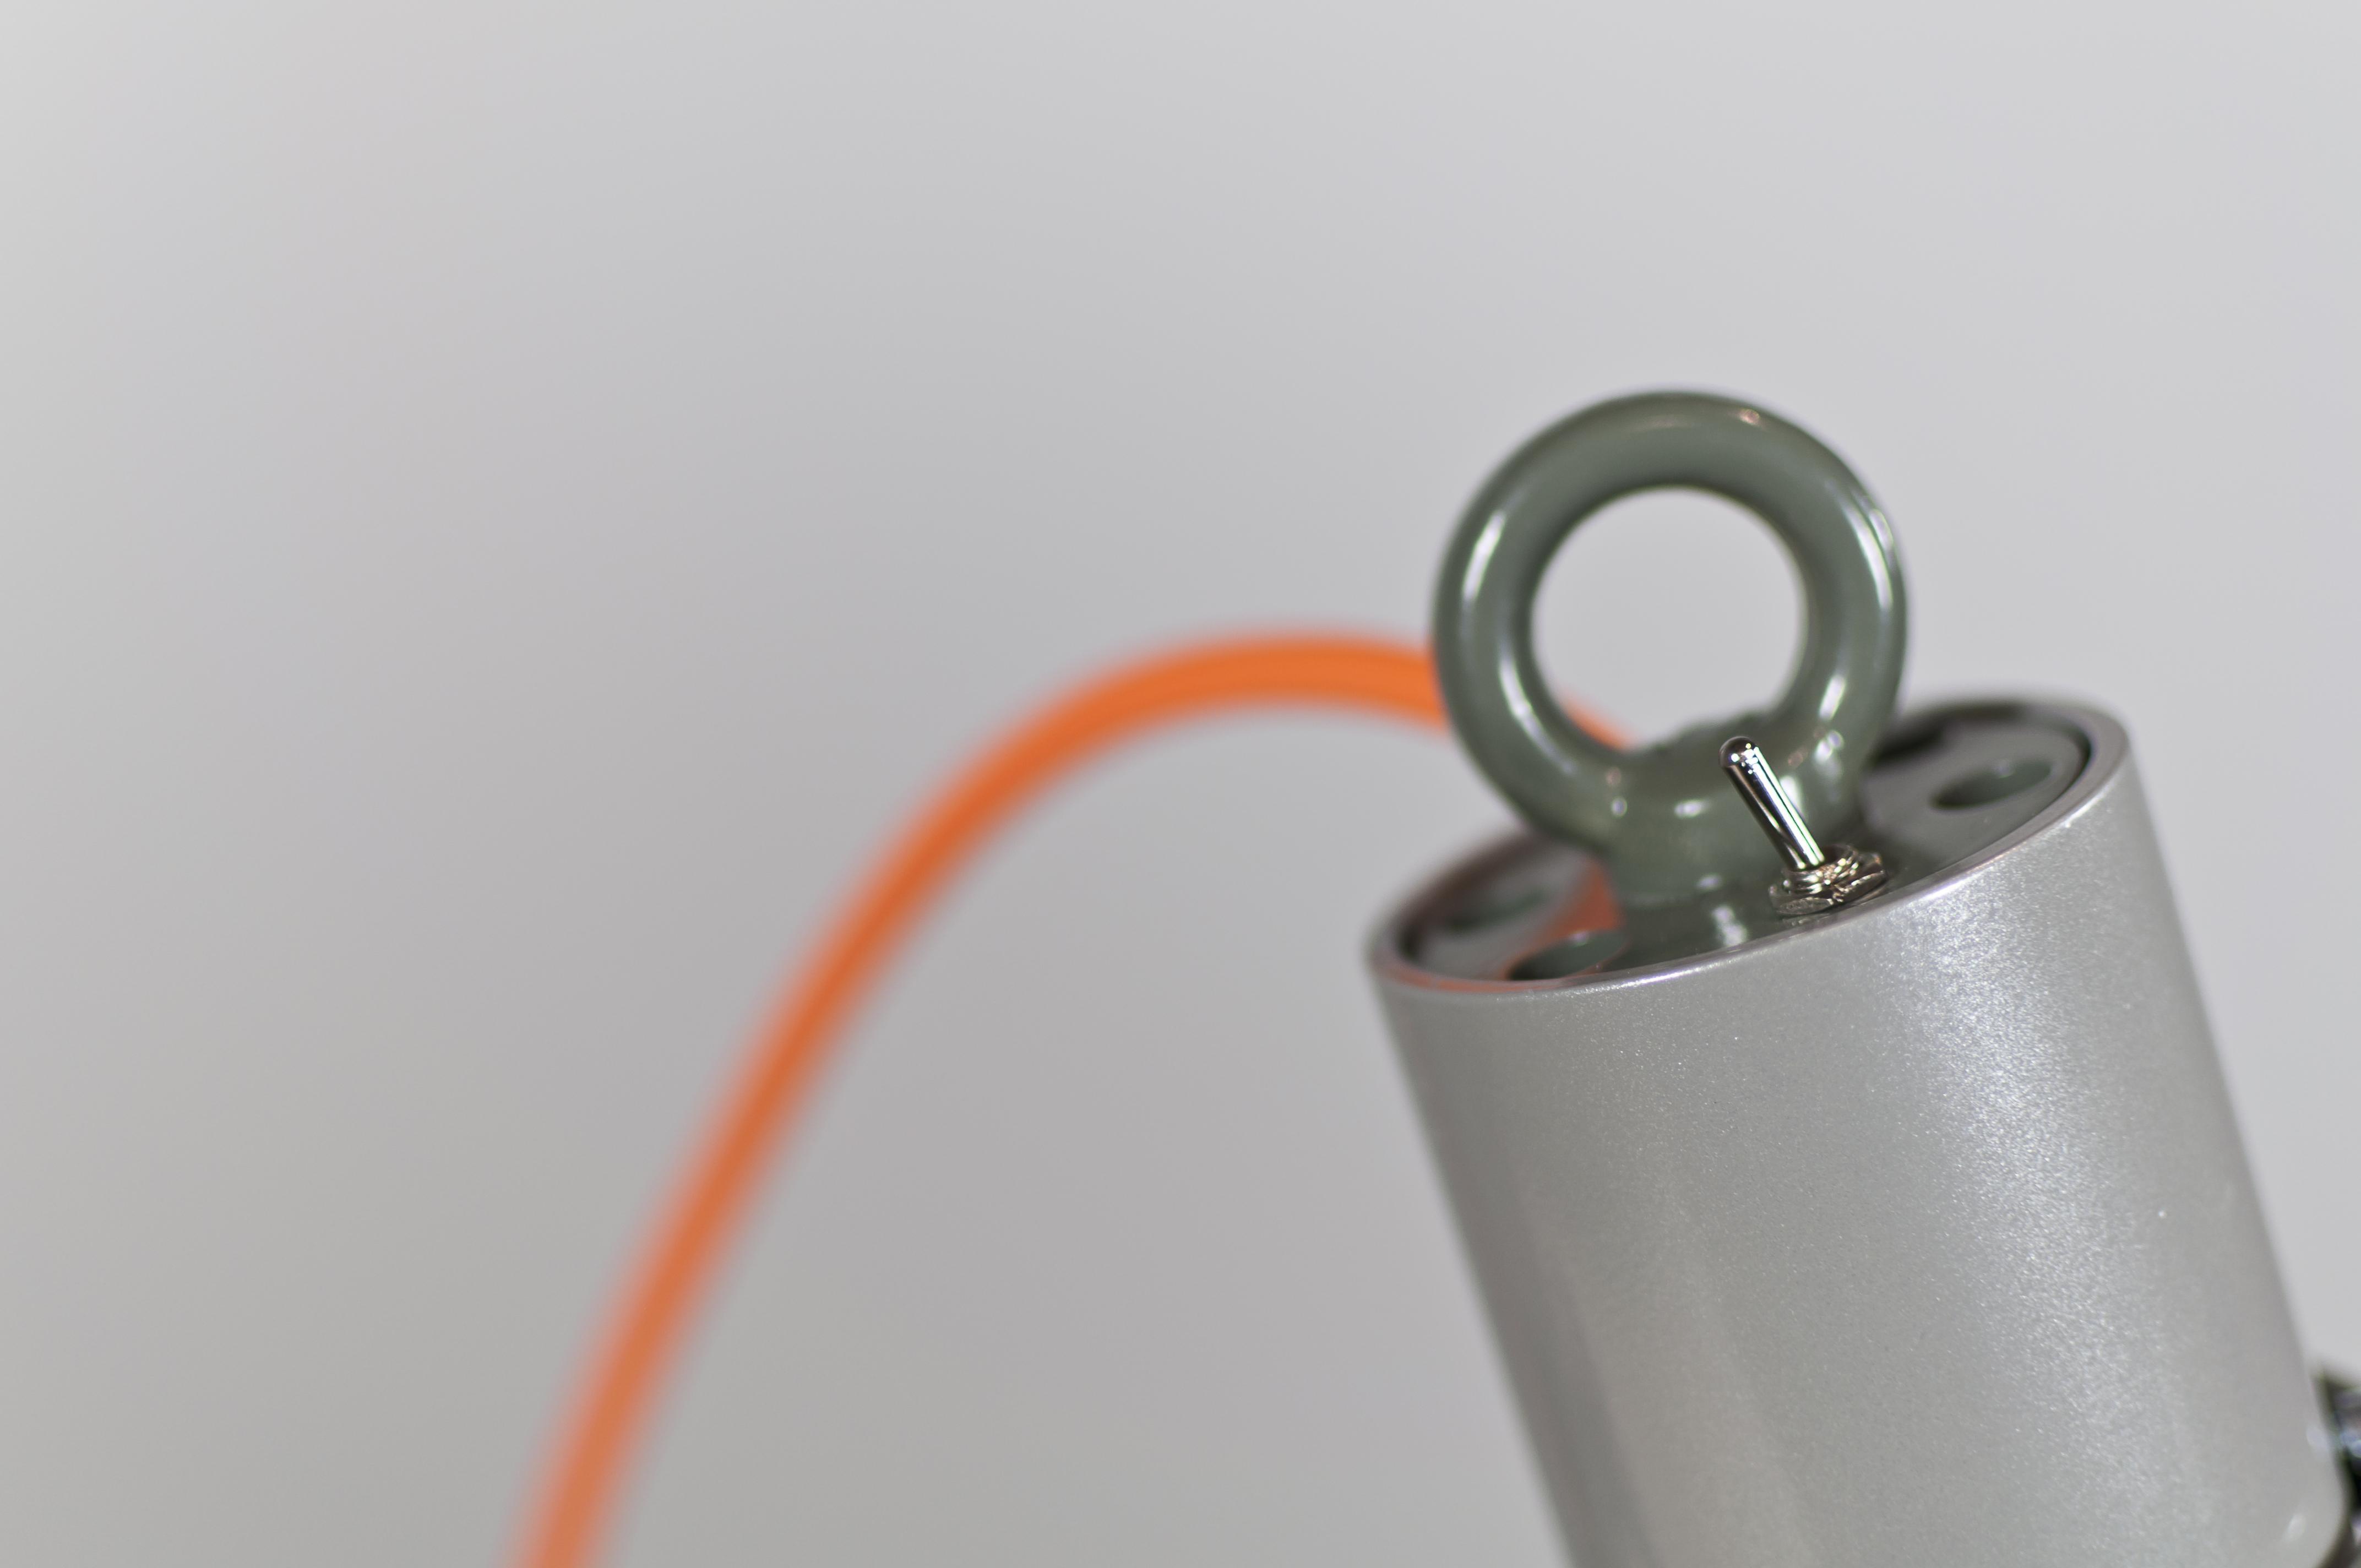 Wandleuchte im industrie design led halogen - Wandlampe industriedesign ...